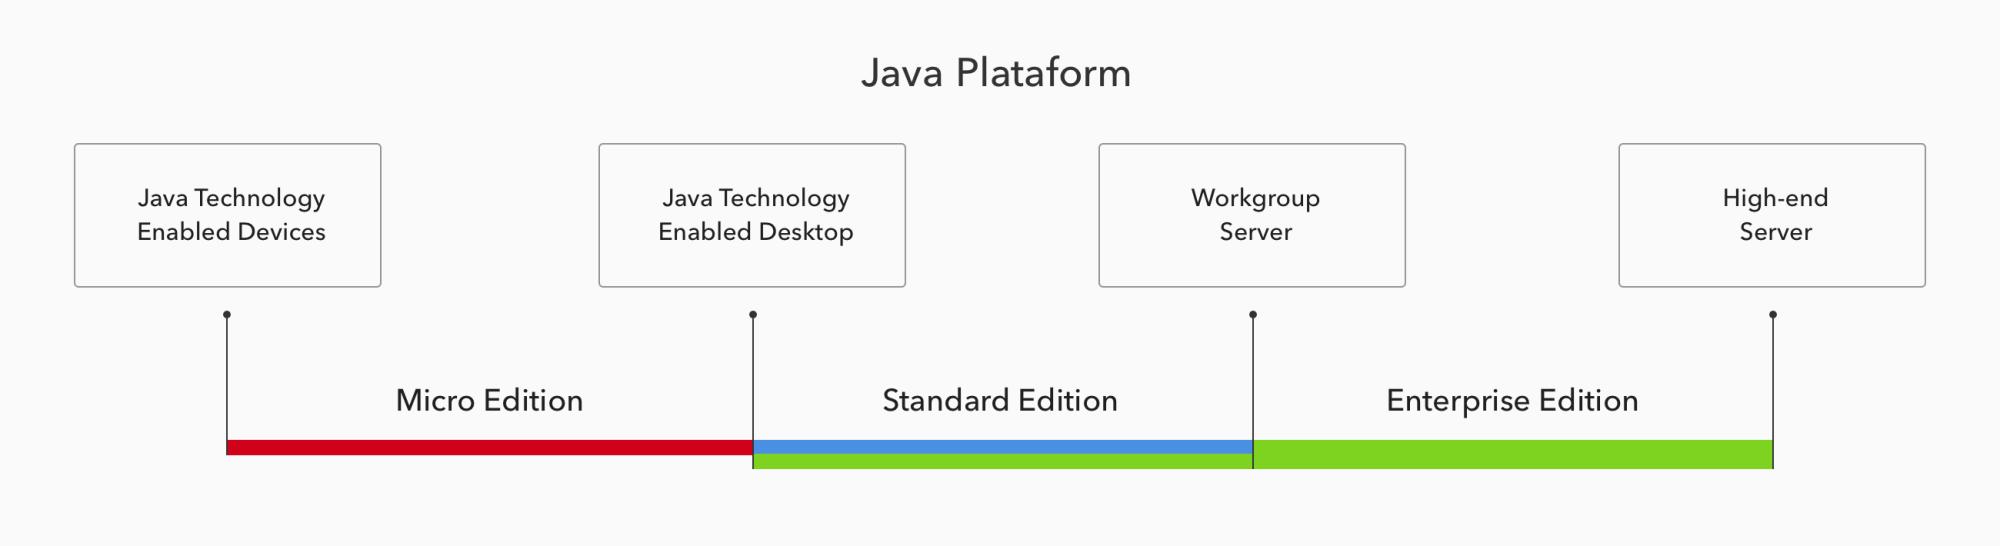 hight resolution of java editions